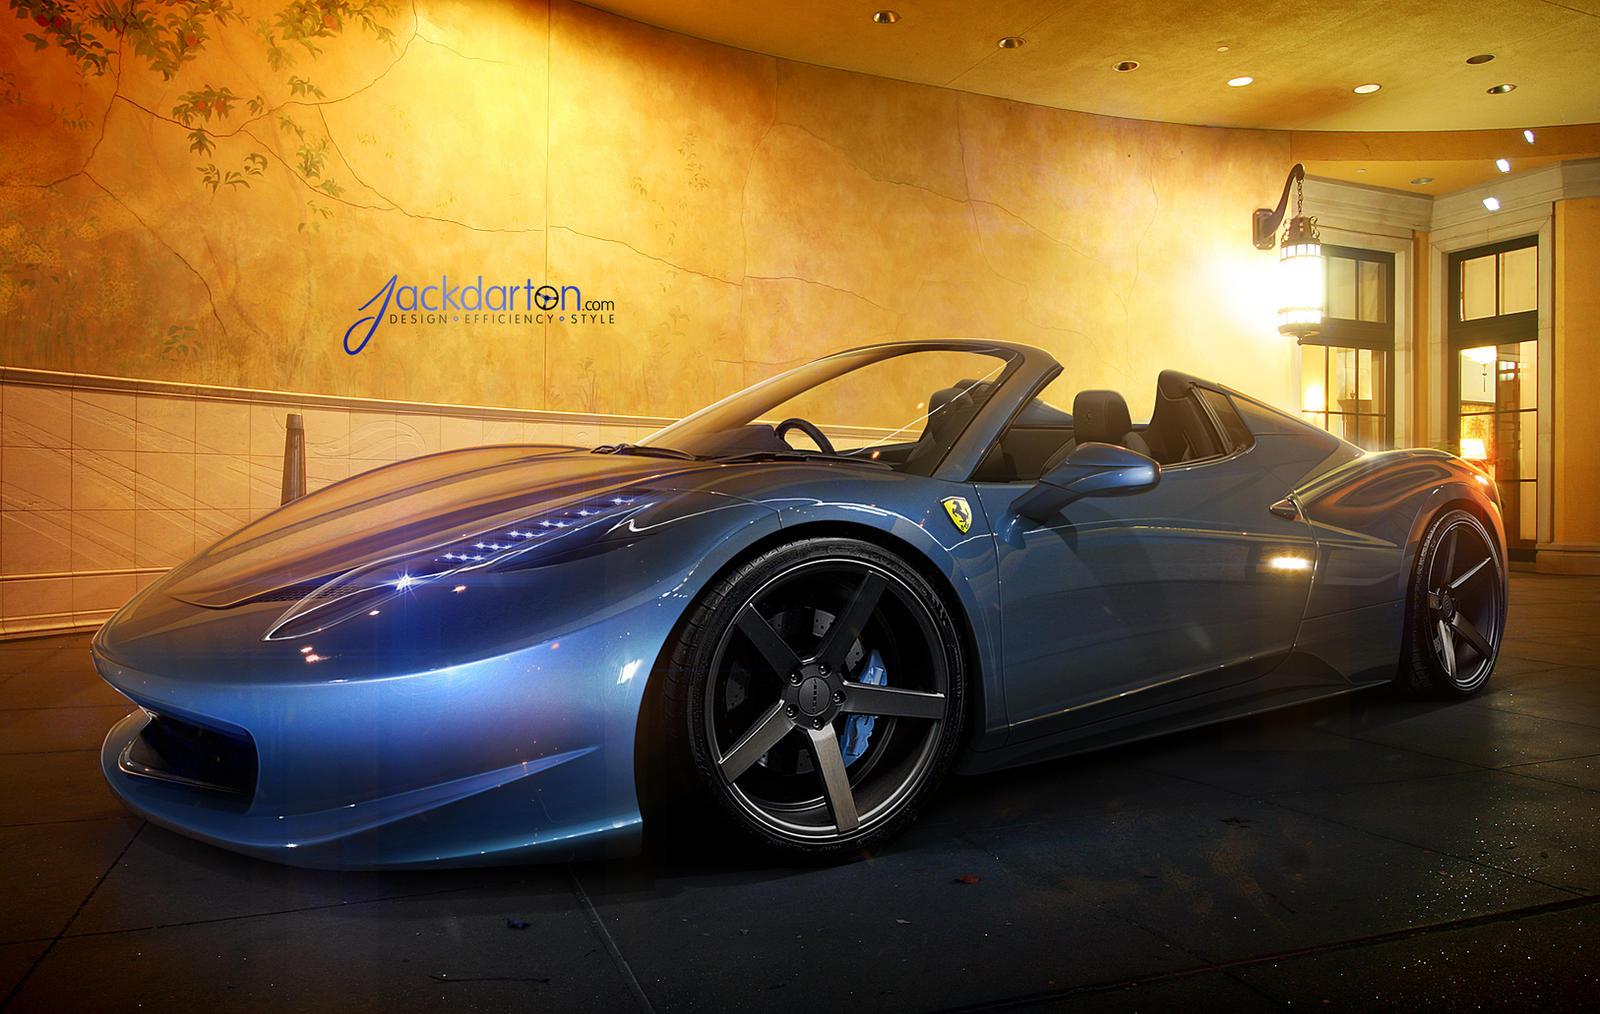 458 Italia Spyder by jackdarton